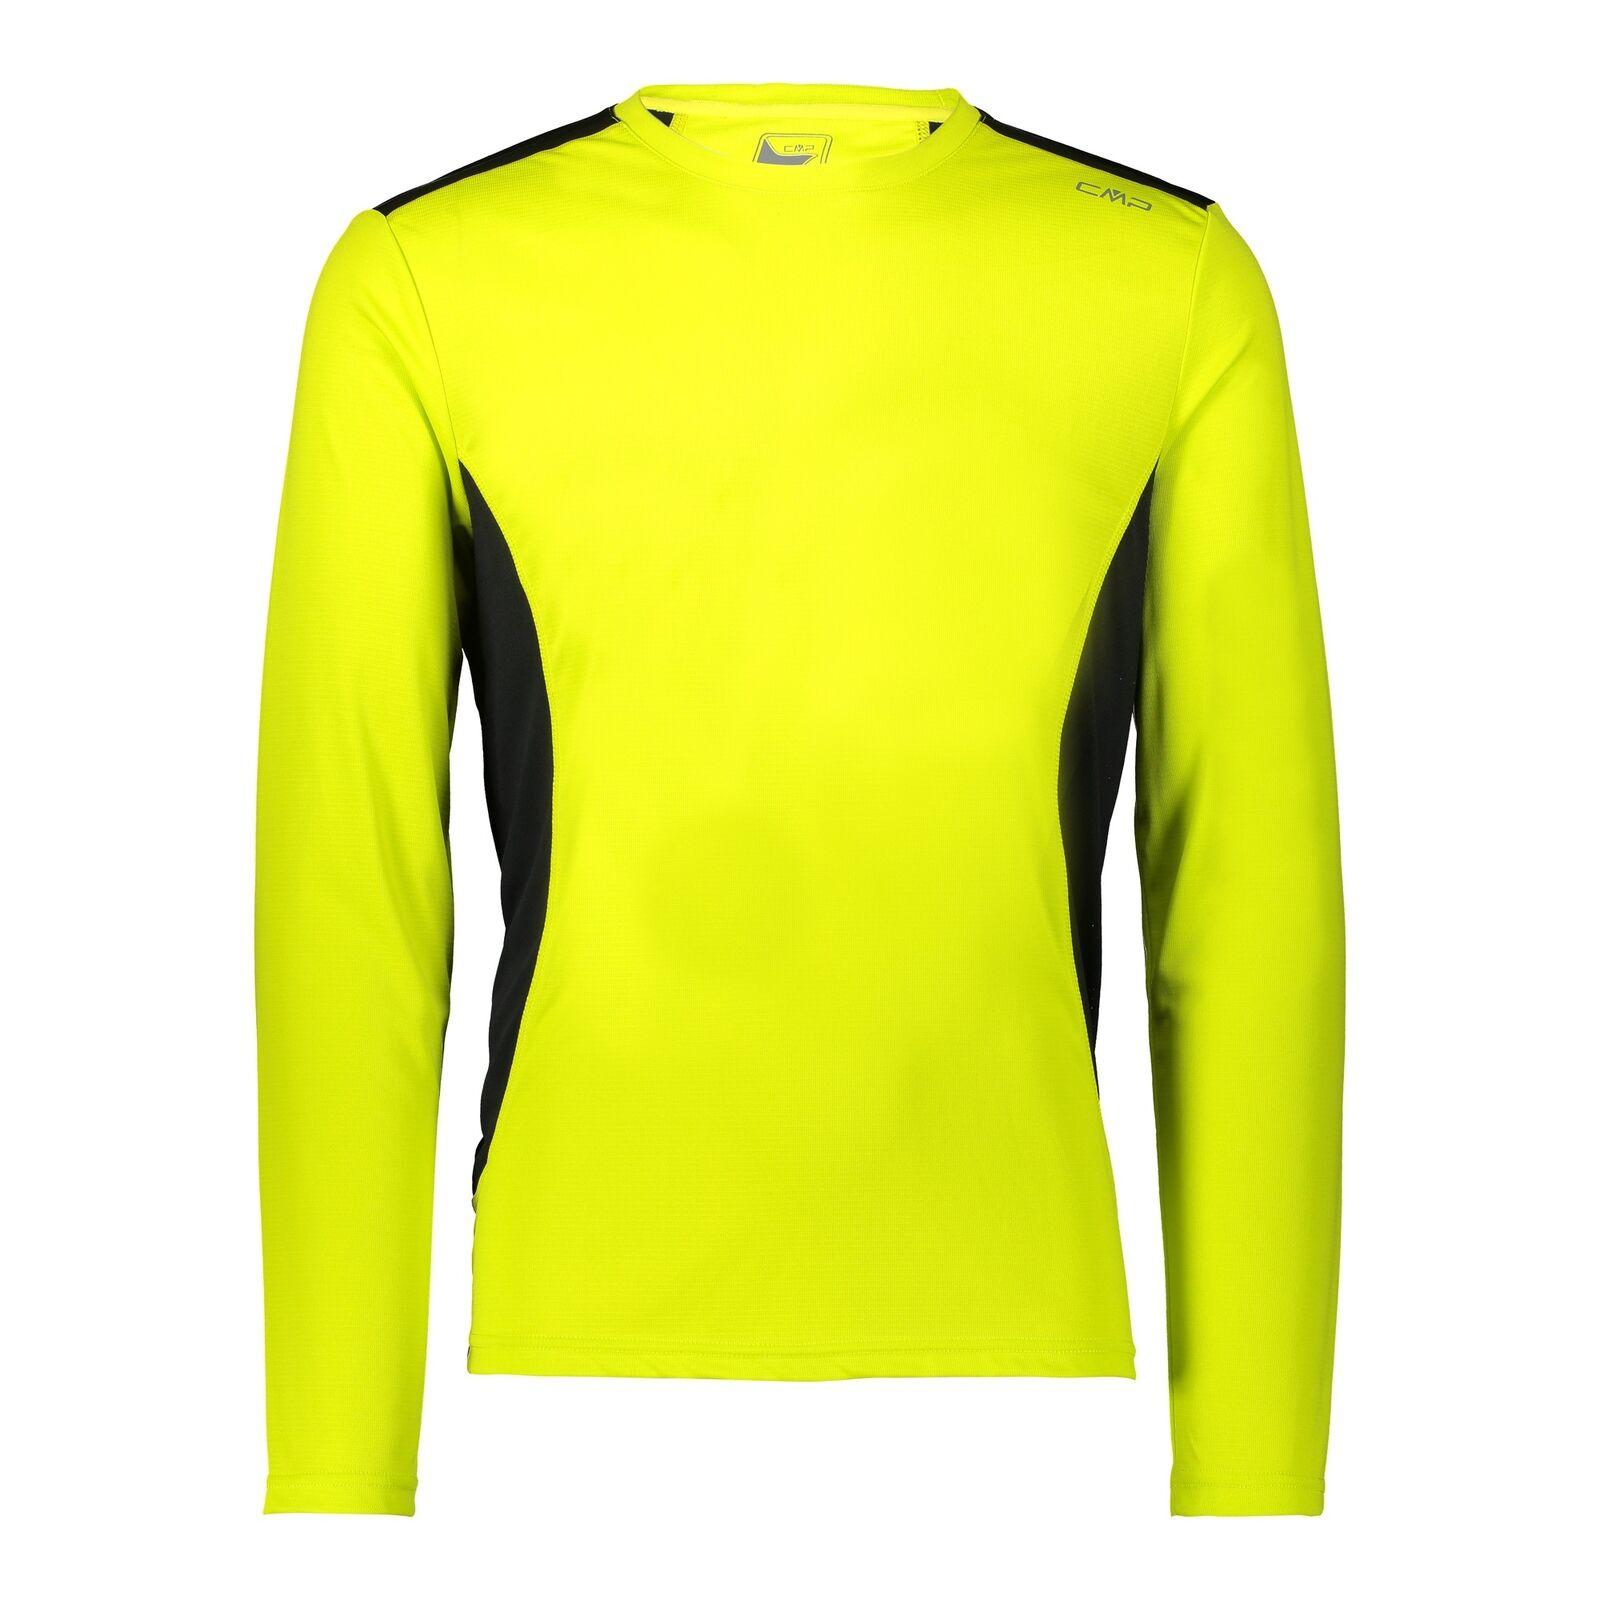 CMP Shirt Fonctionnel Chemise un Tee-Shirt yellow  Respirant Antibactérien  high quality